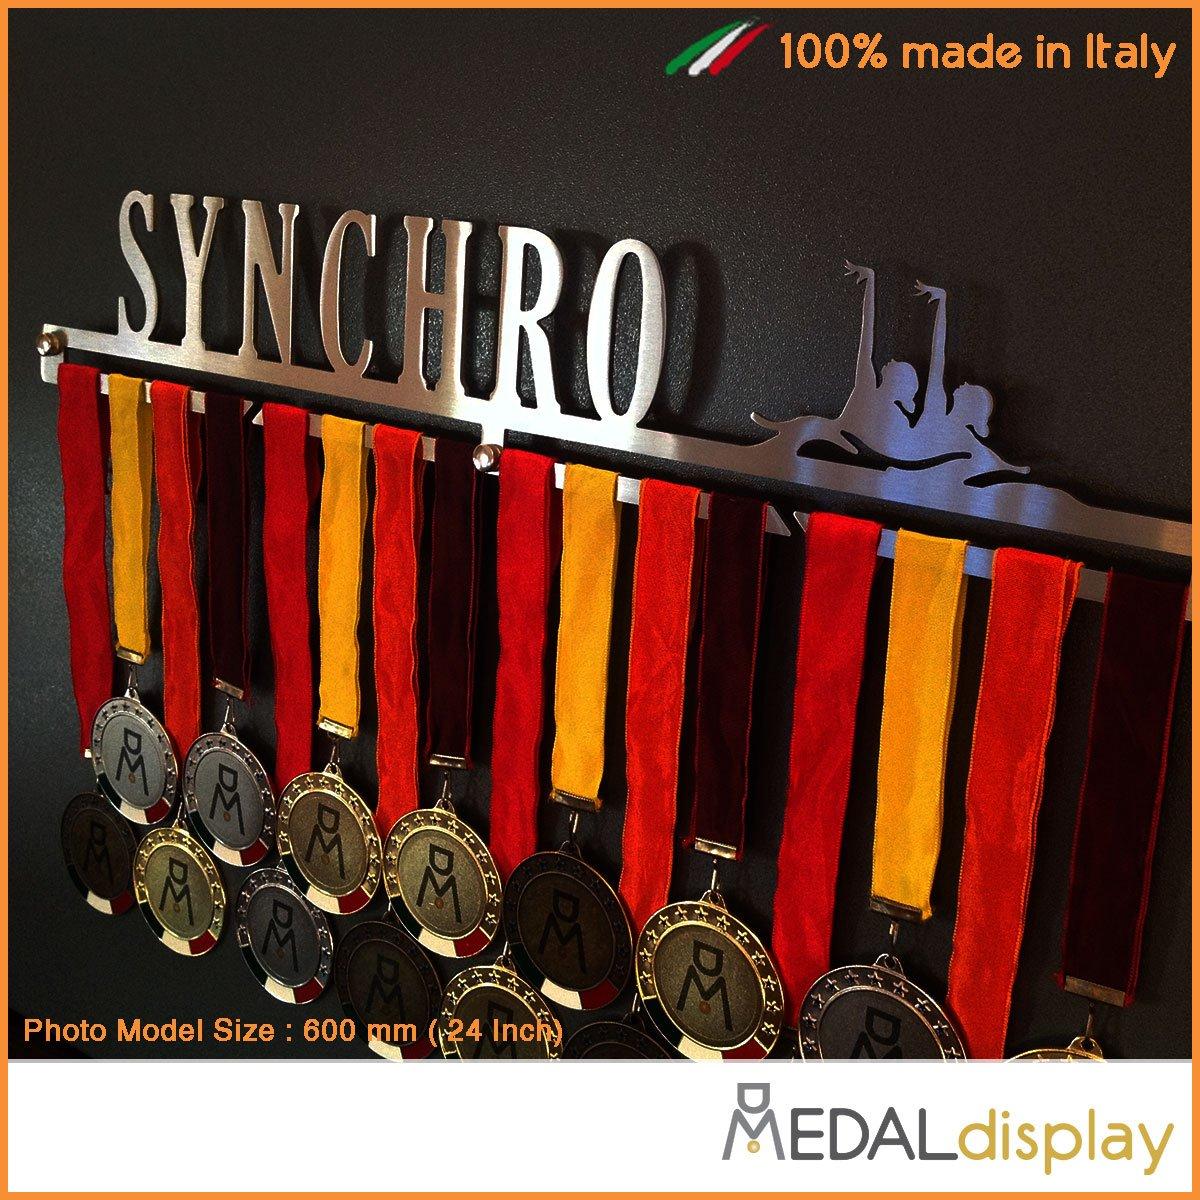 MEDALdisplay Synchro Porte-m/édailles natation synchronis/ée m/édaillon mural